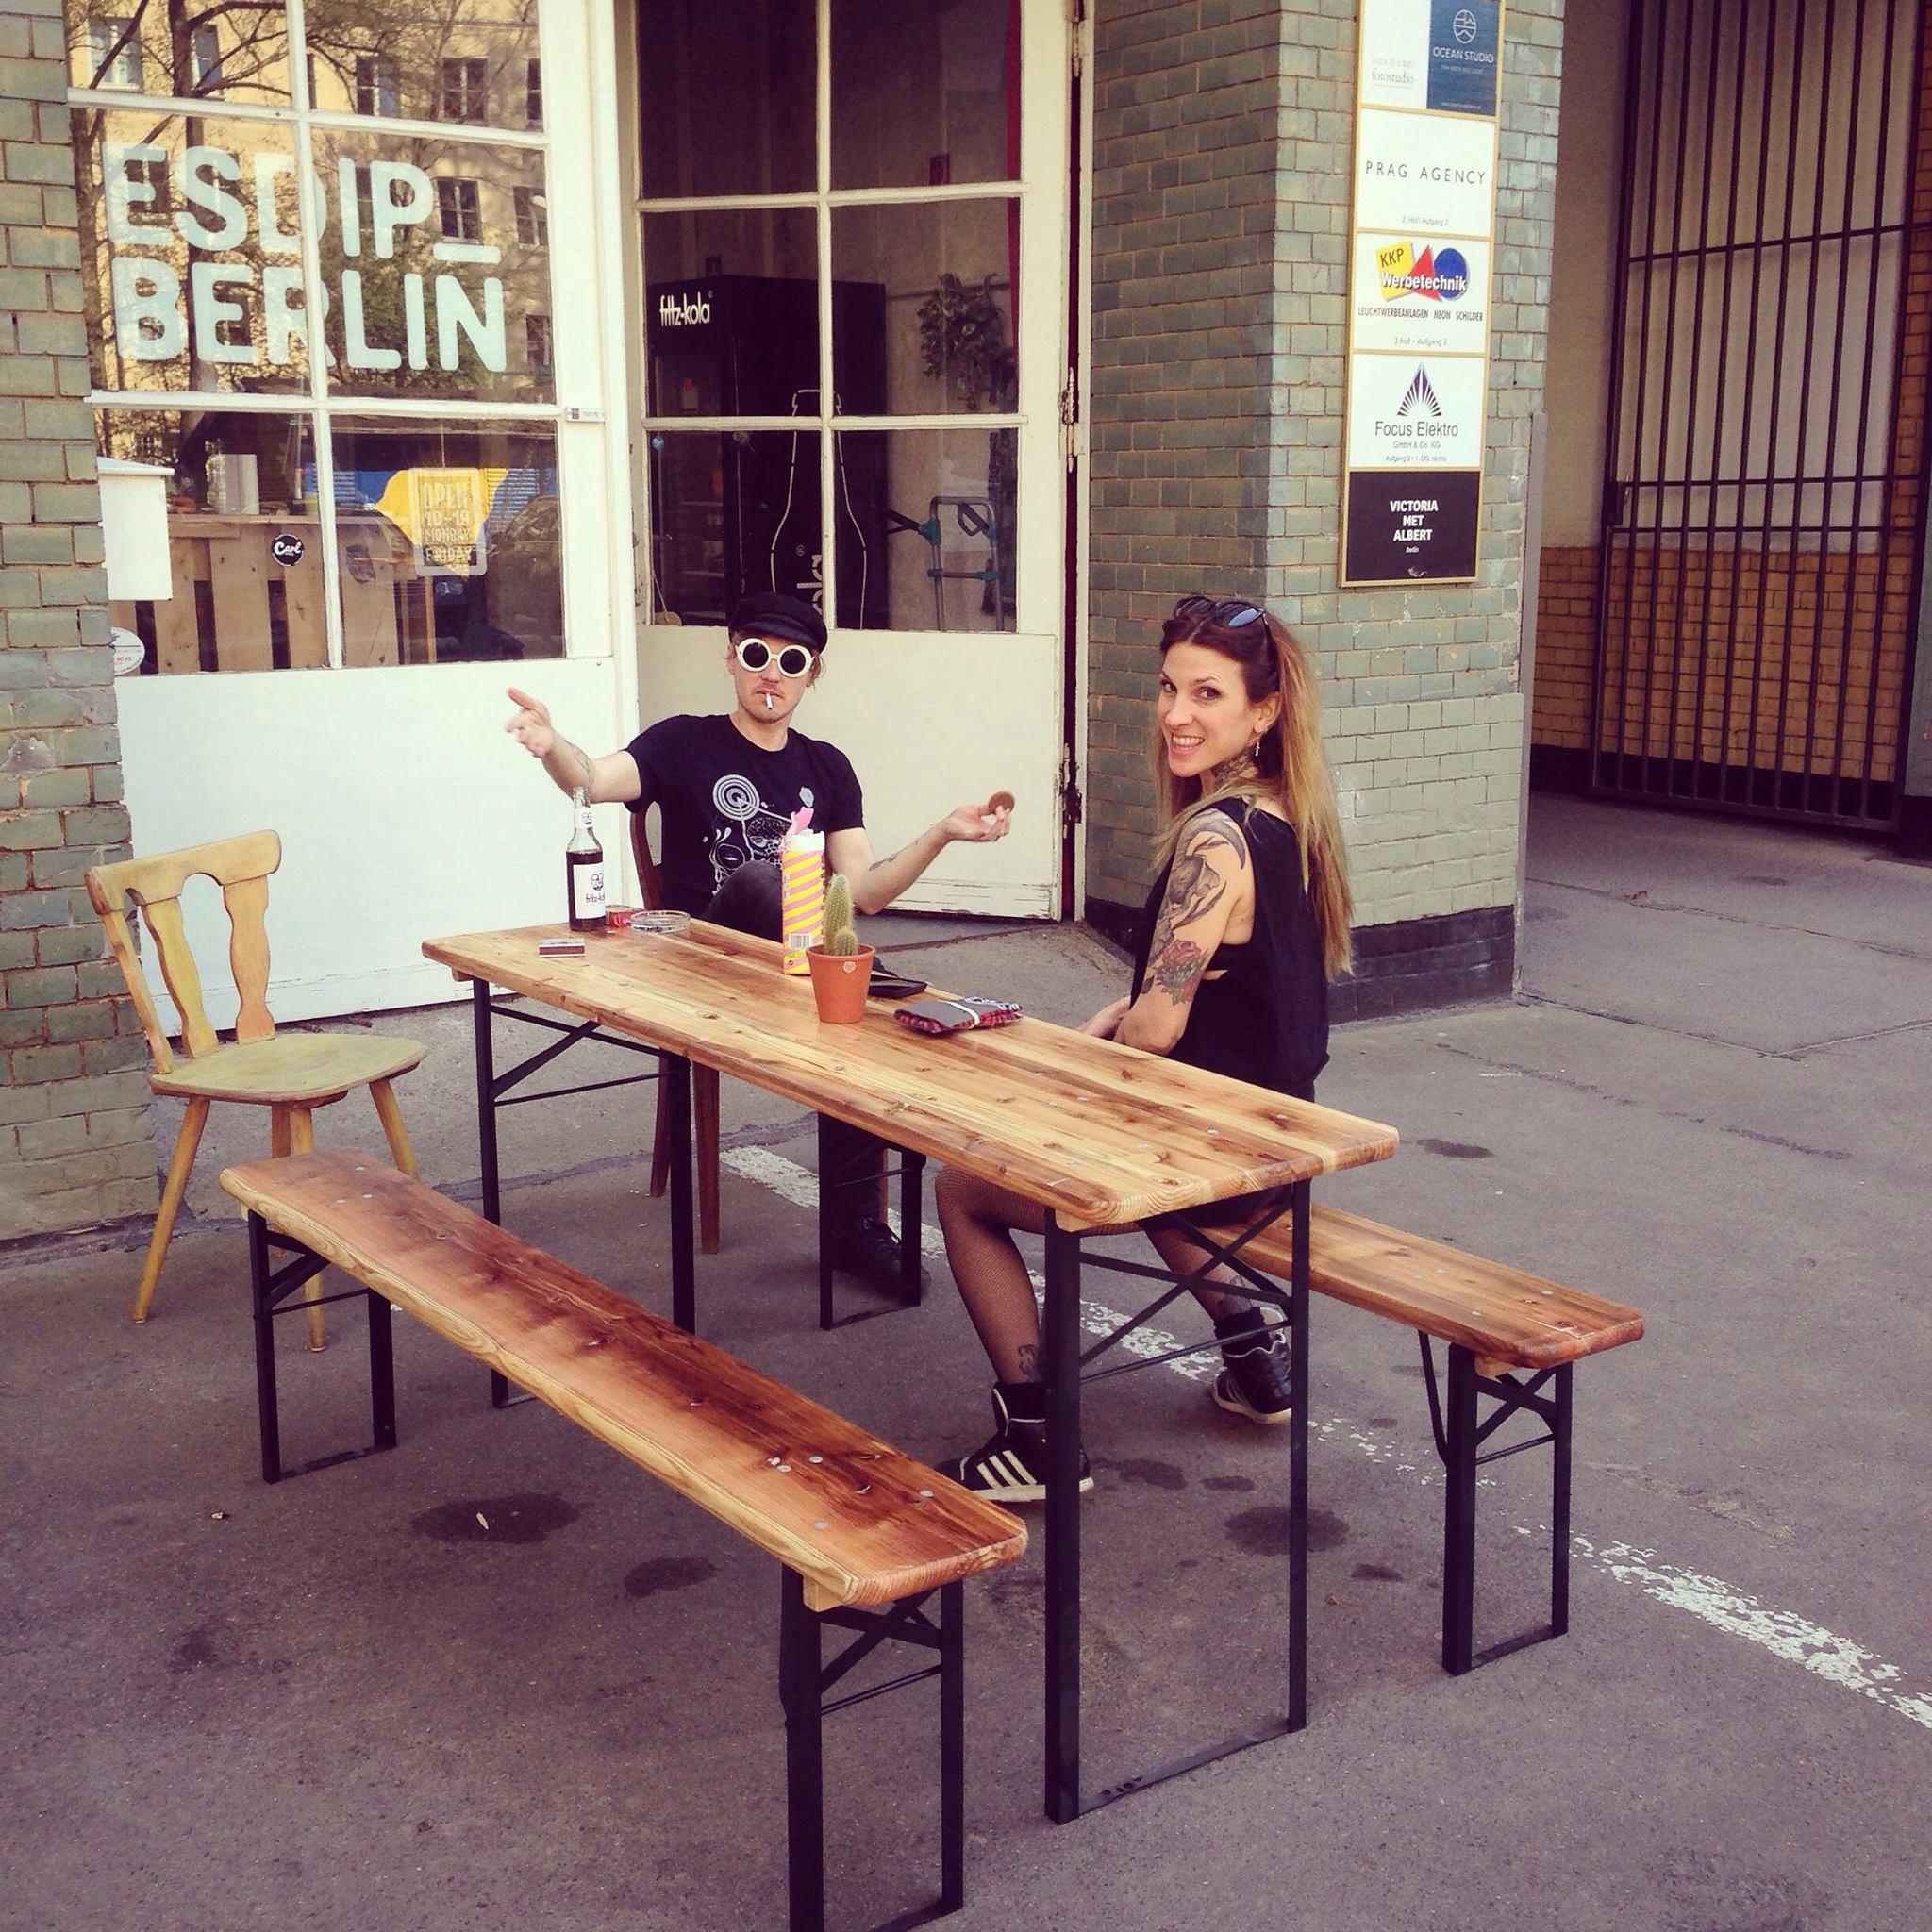 ESDIP Berlin, Berlin